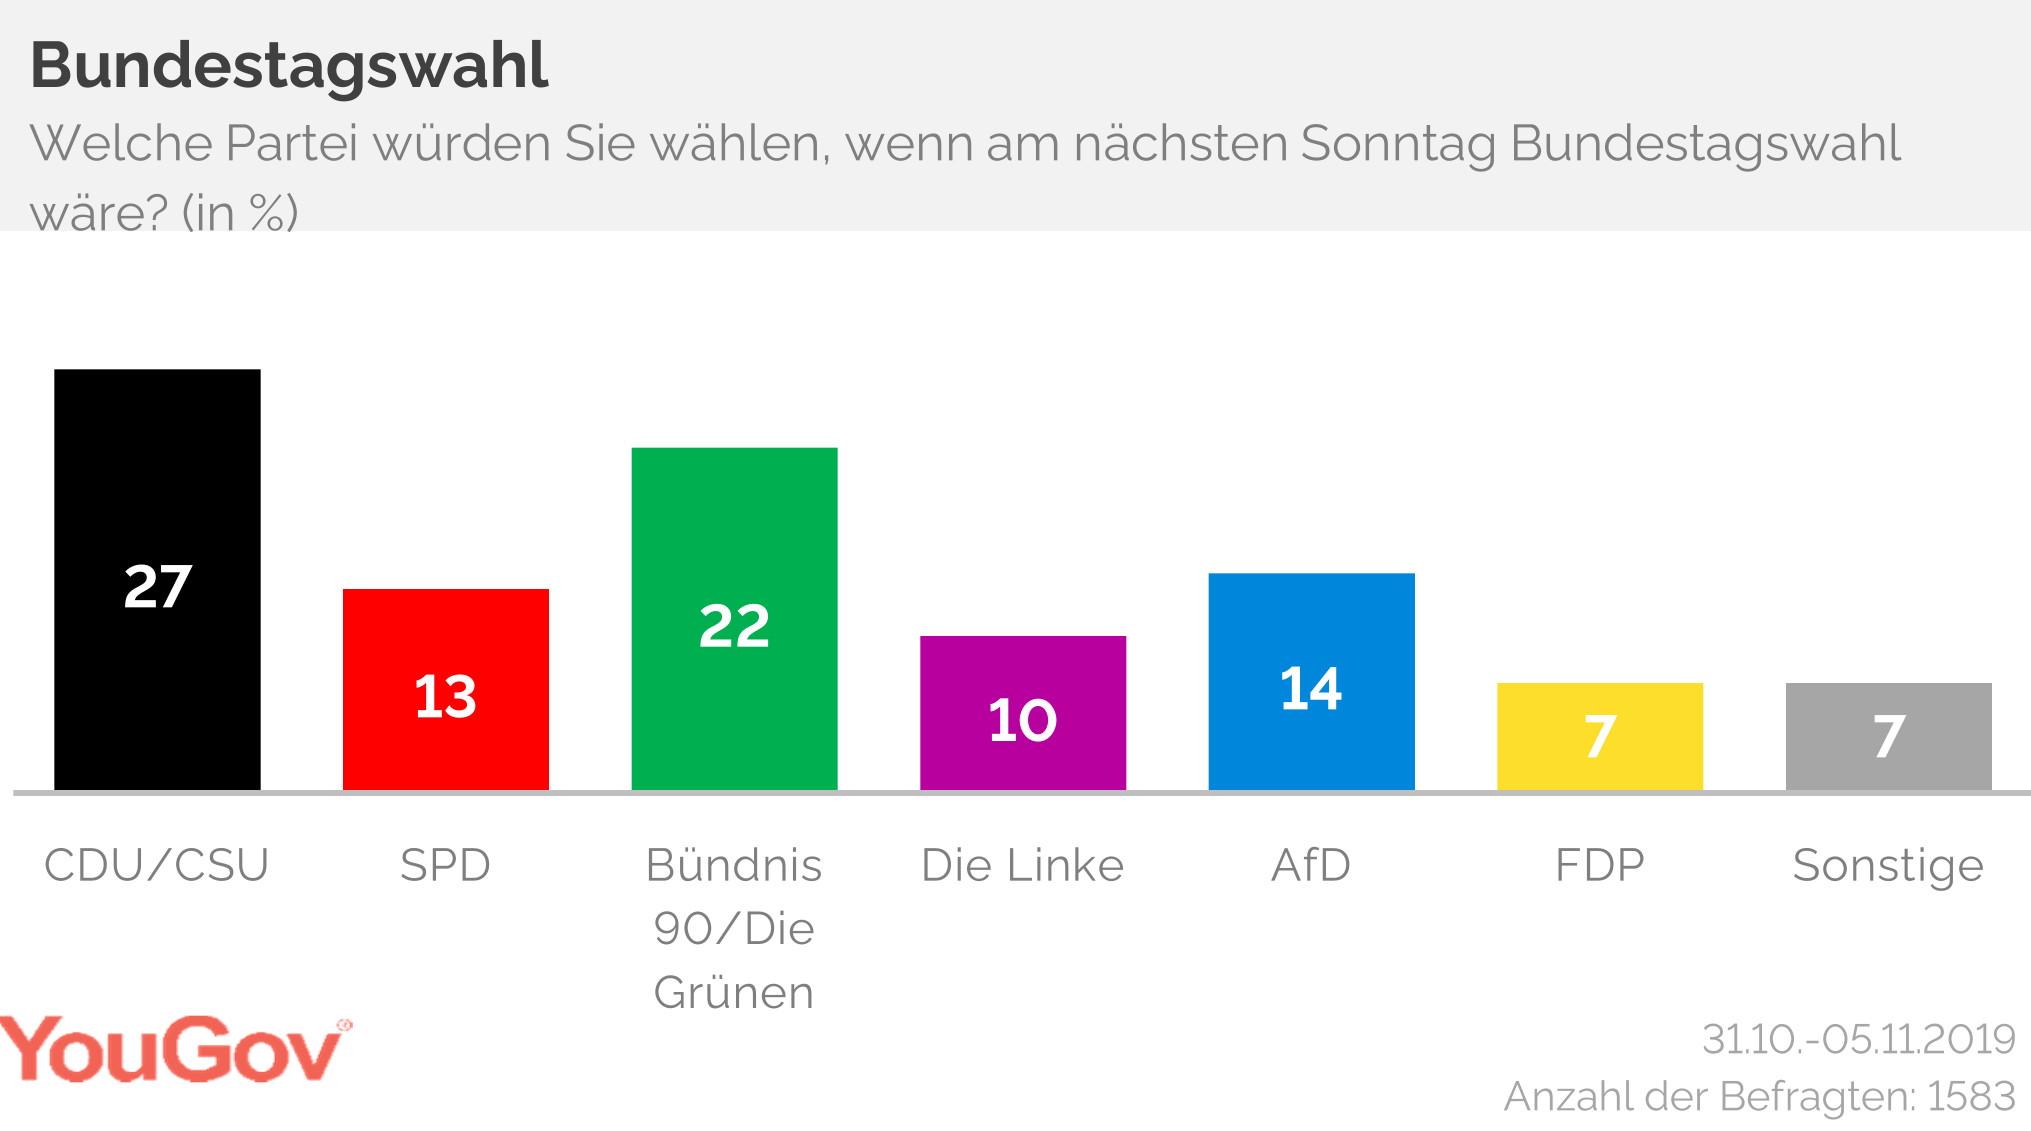 Bundestag Sonntagsfrage